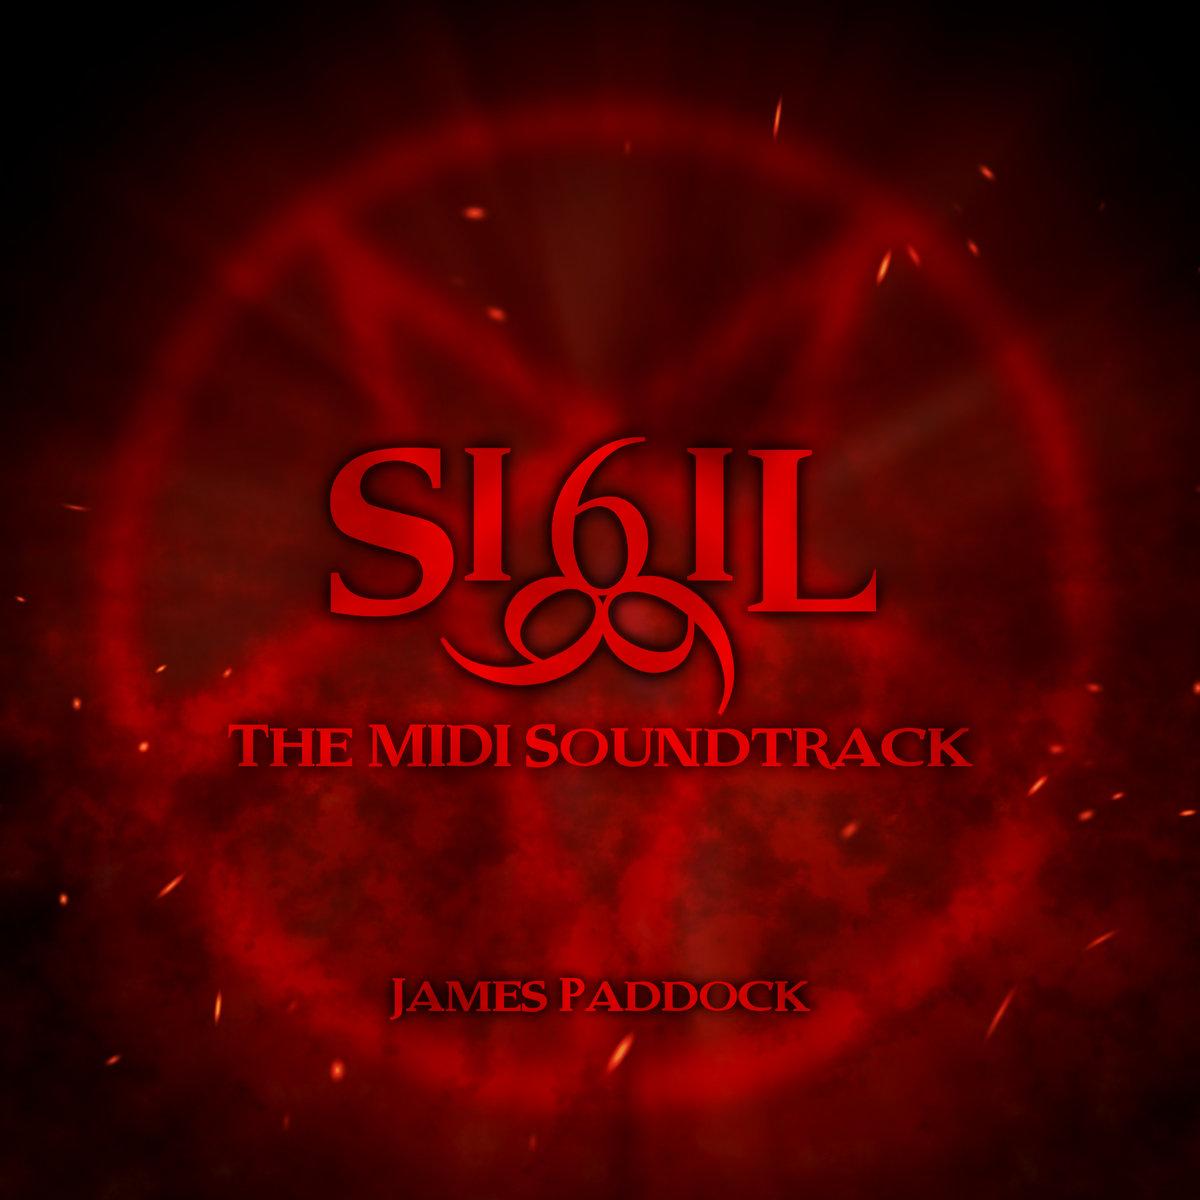 SIGIL - The MIDI Soundtrack | James Paddock